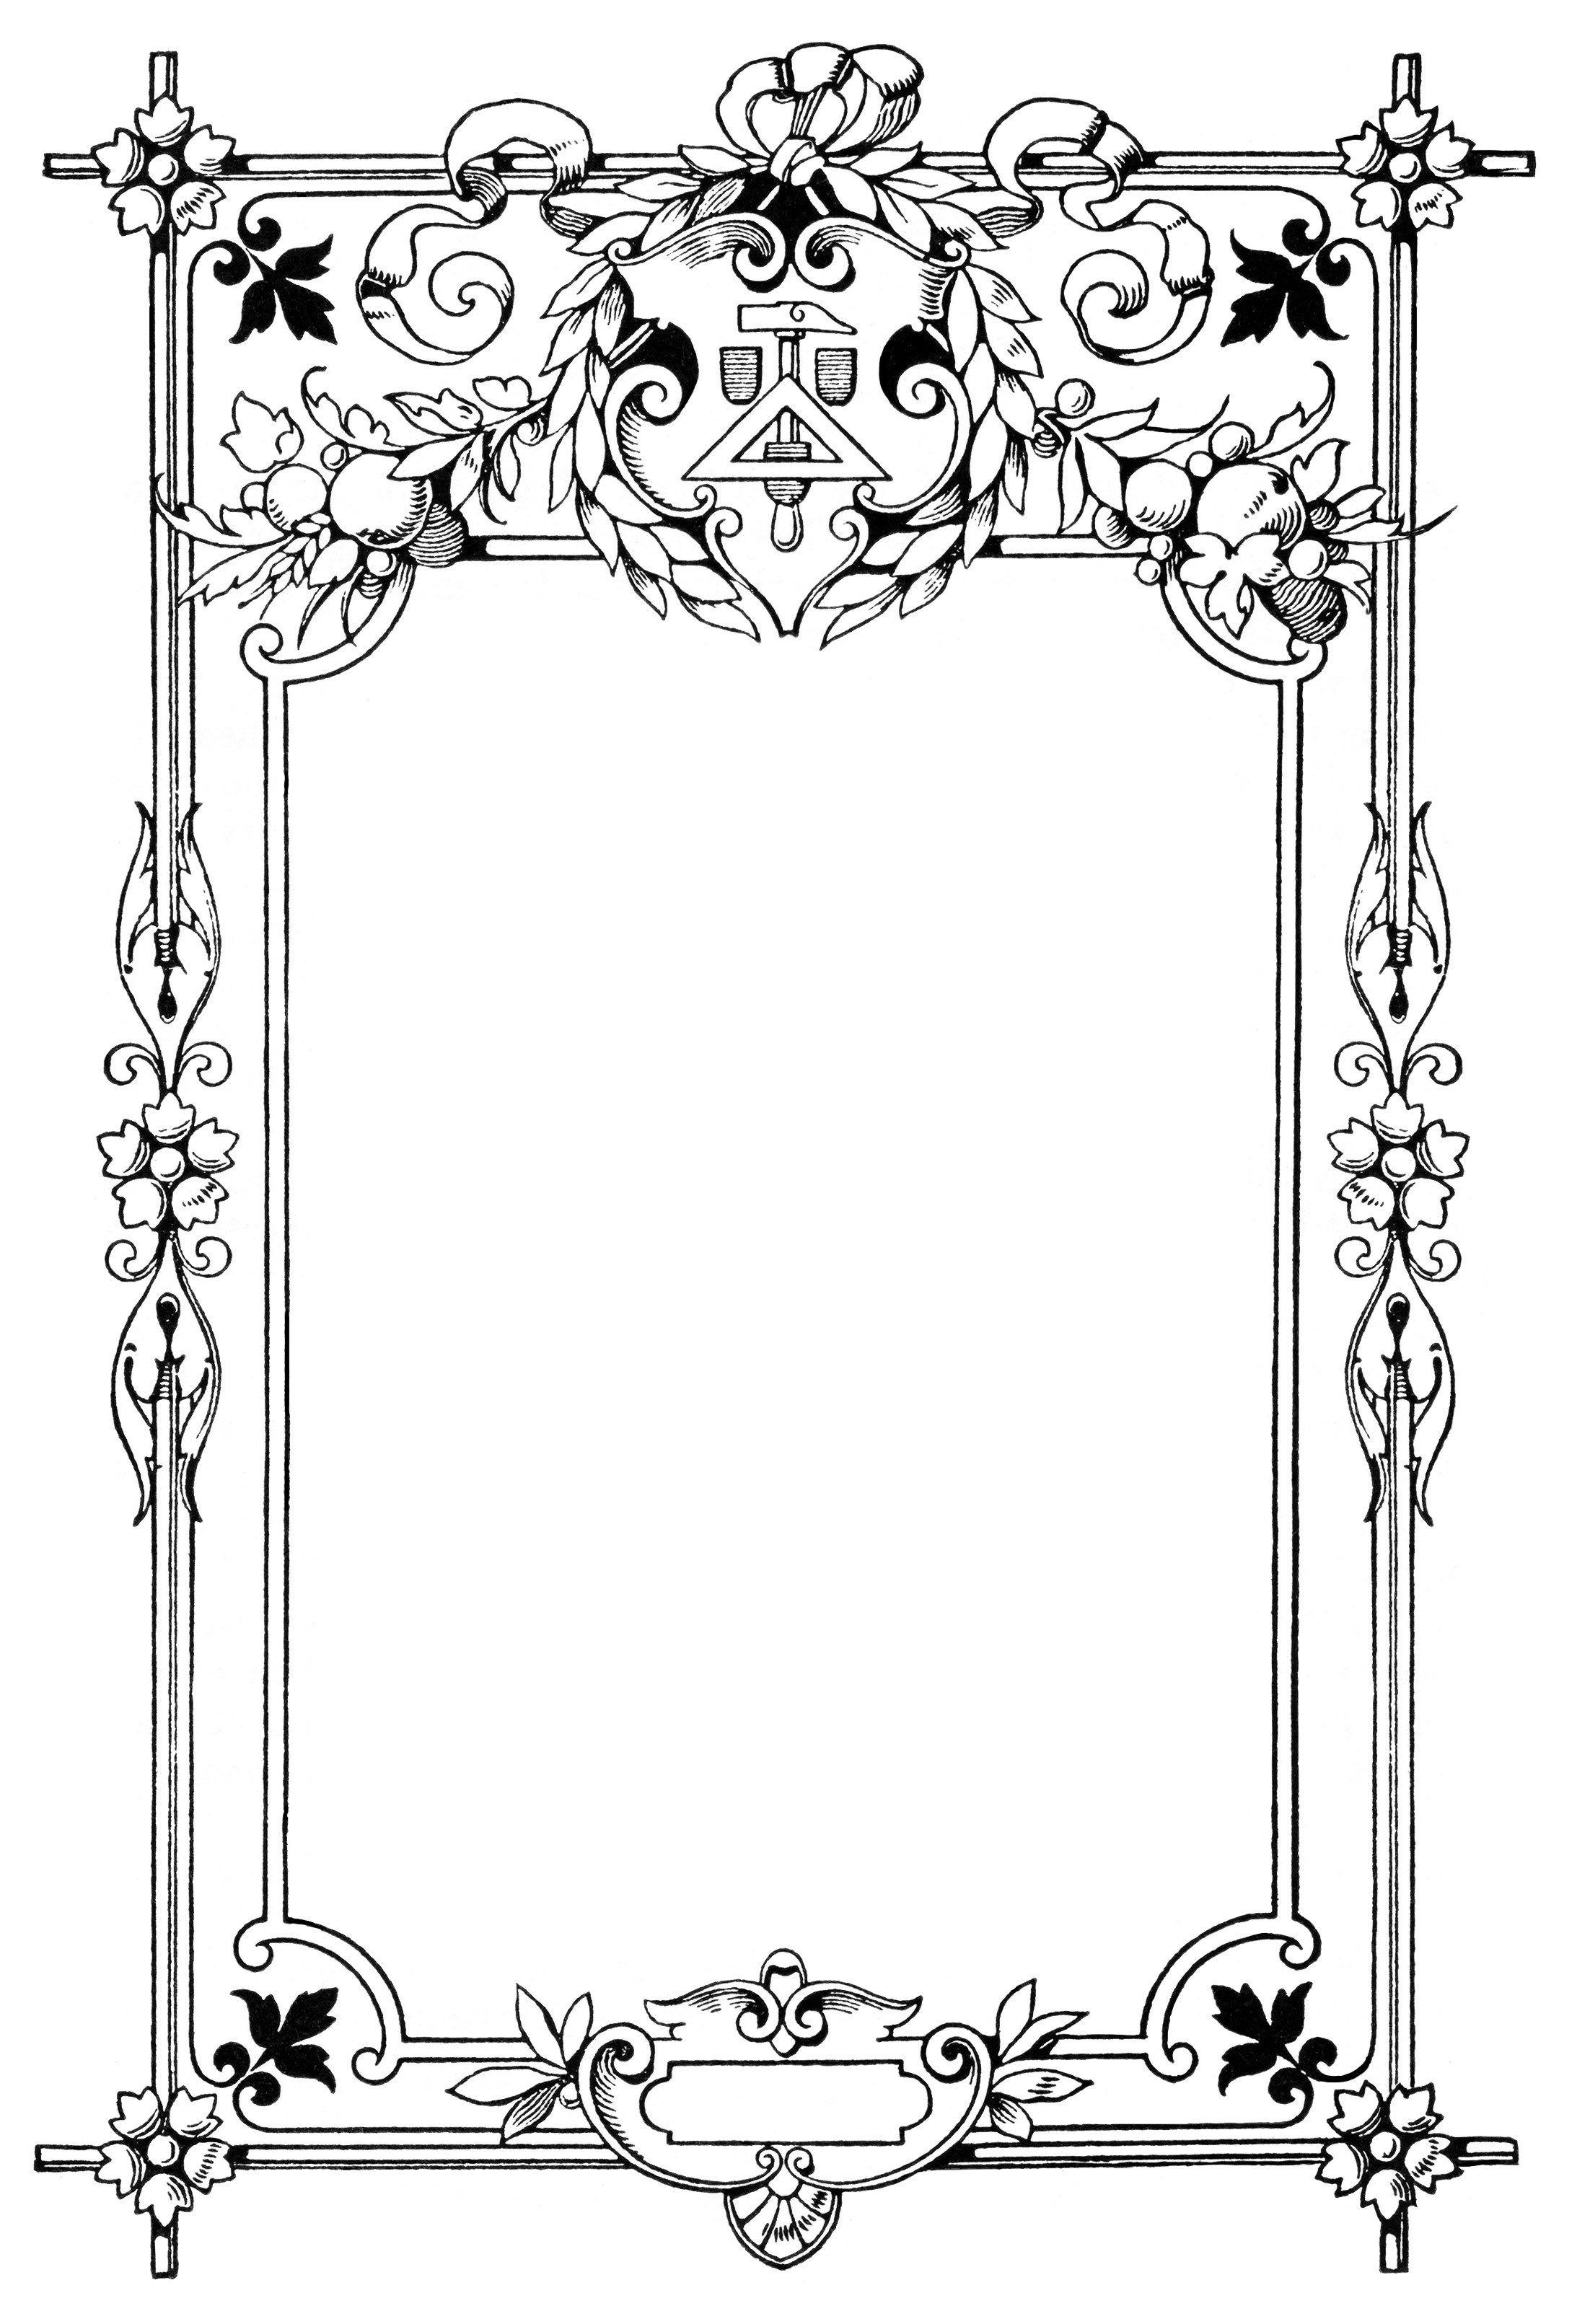 Vintage Frame Clip Art Swirly Ornate Illustration Black And White Clipart Ornamental Frame Graphic Fancy Frame D Clip Art Borders Clip Art Clip Art Vintage